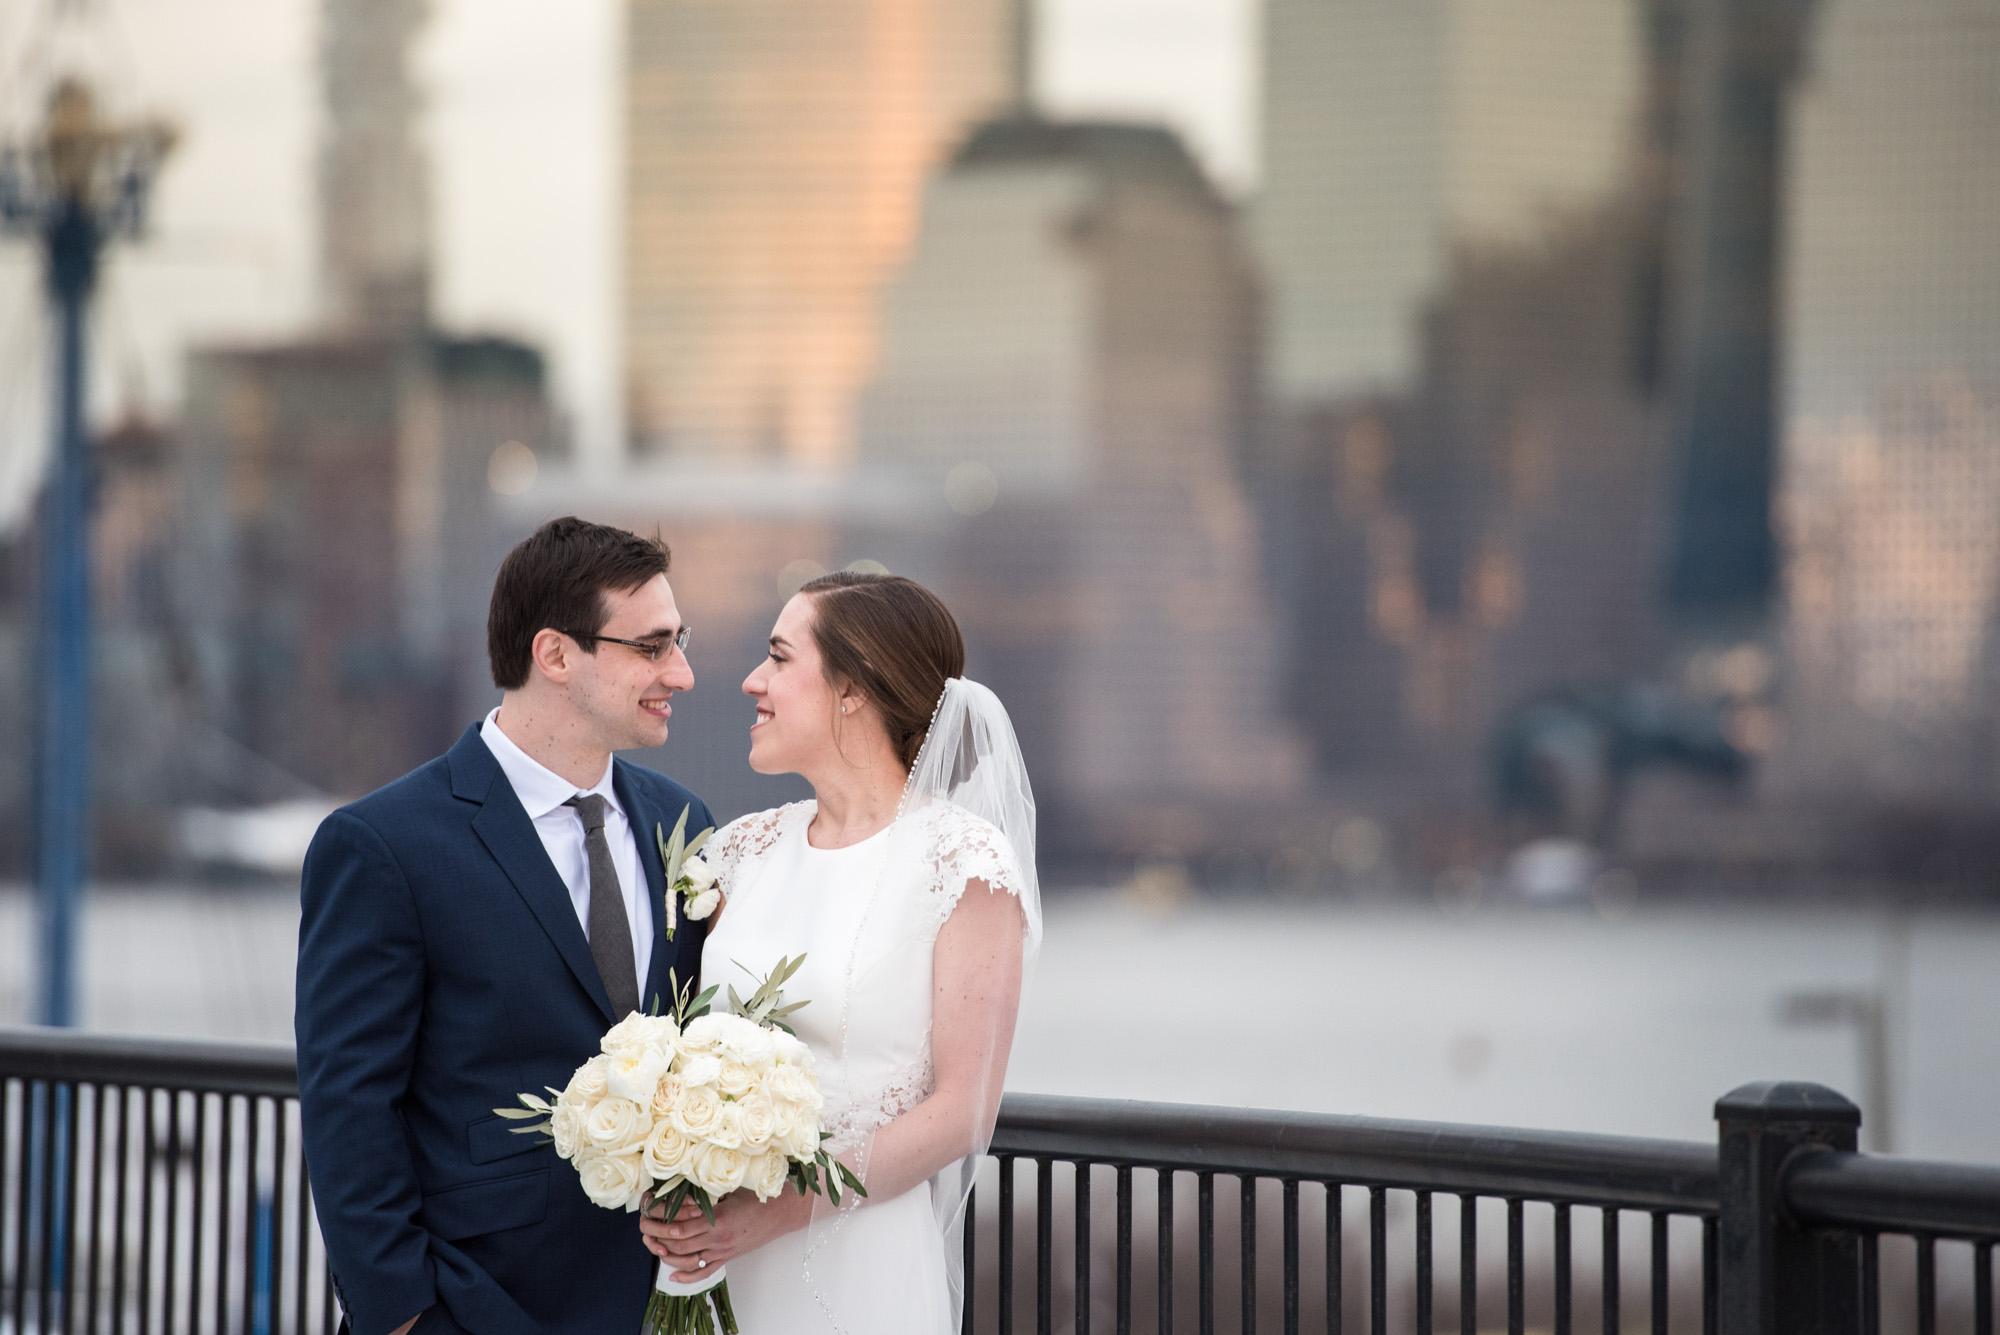 nj-wedding-photographer-maritime-parc-maria-david-35.jpg